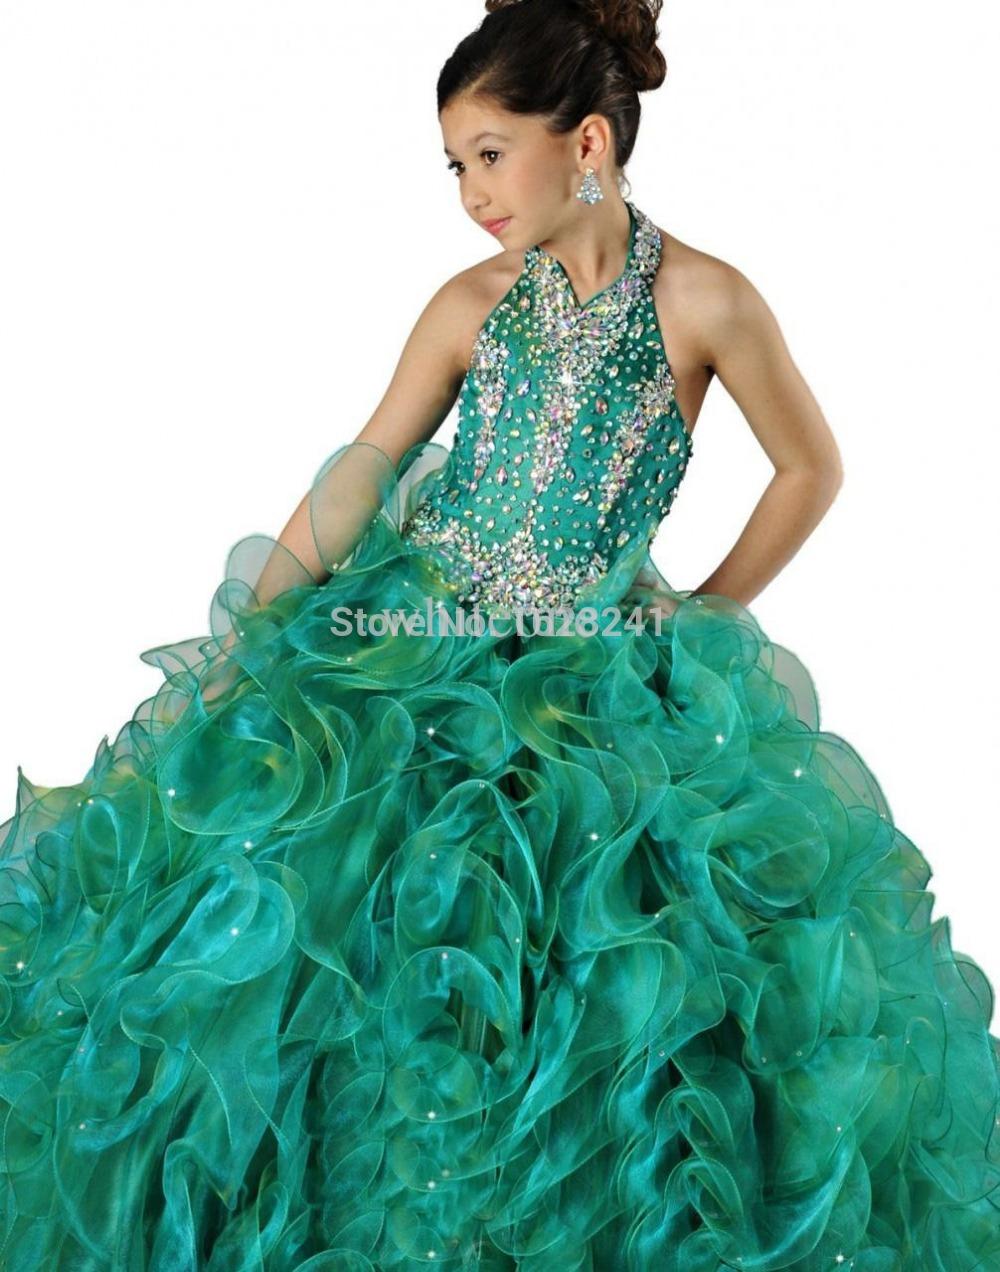 Girls glitz pageant dresses online shopping buy low price teen girls